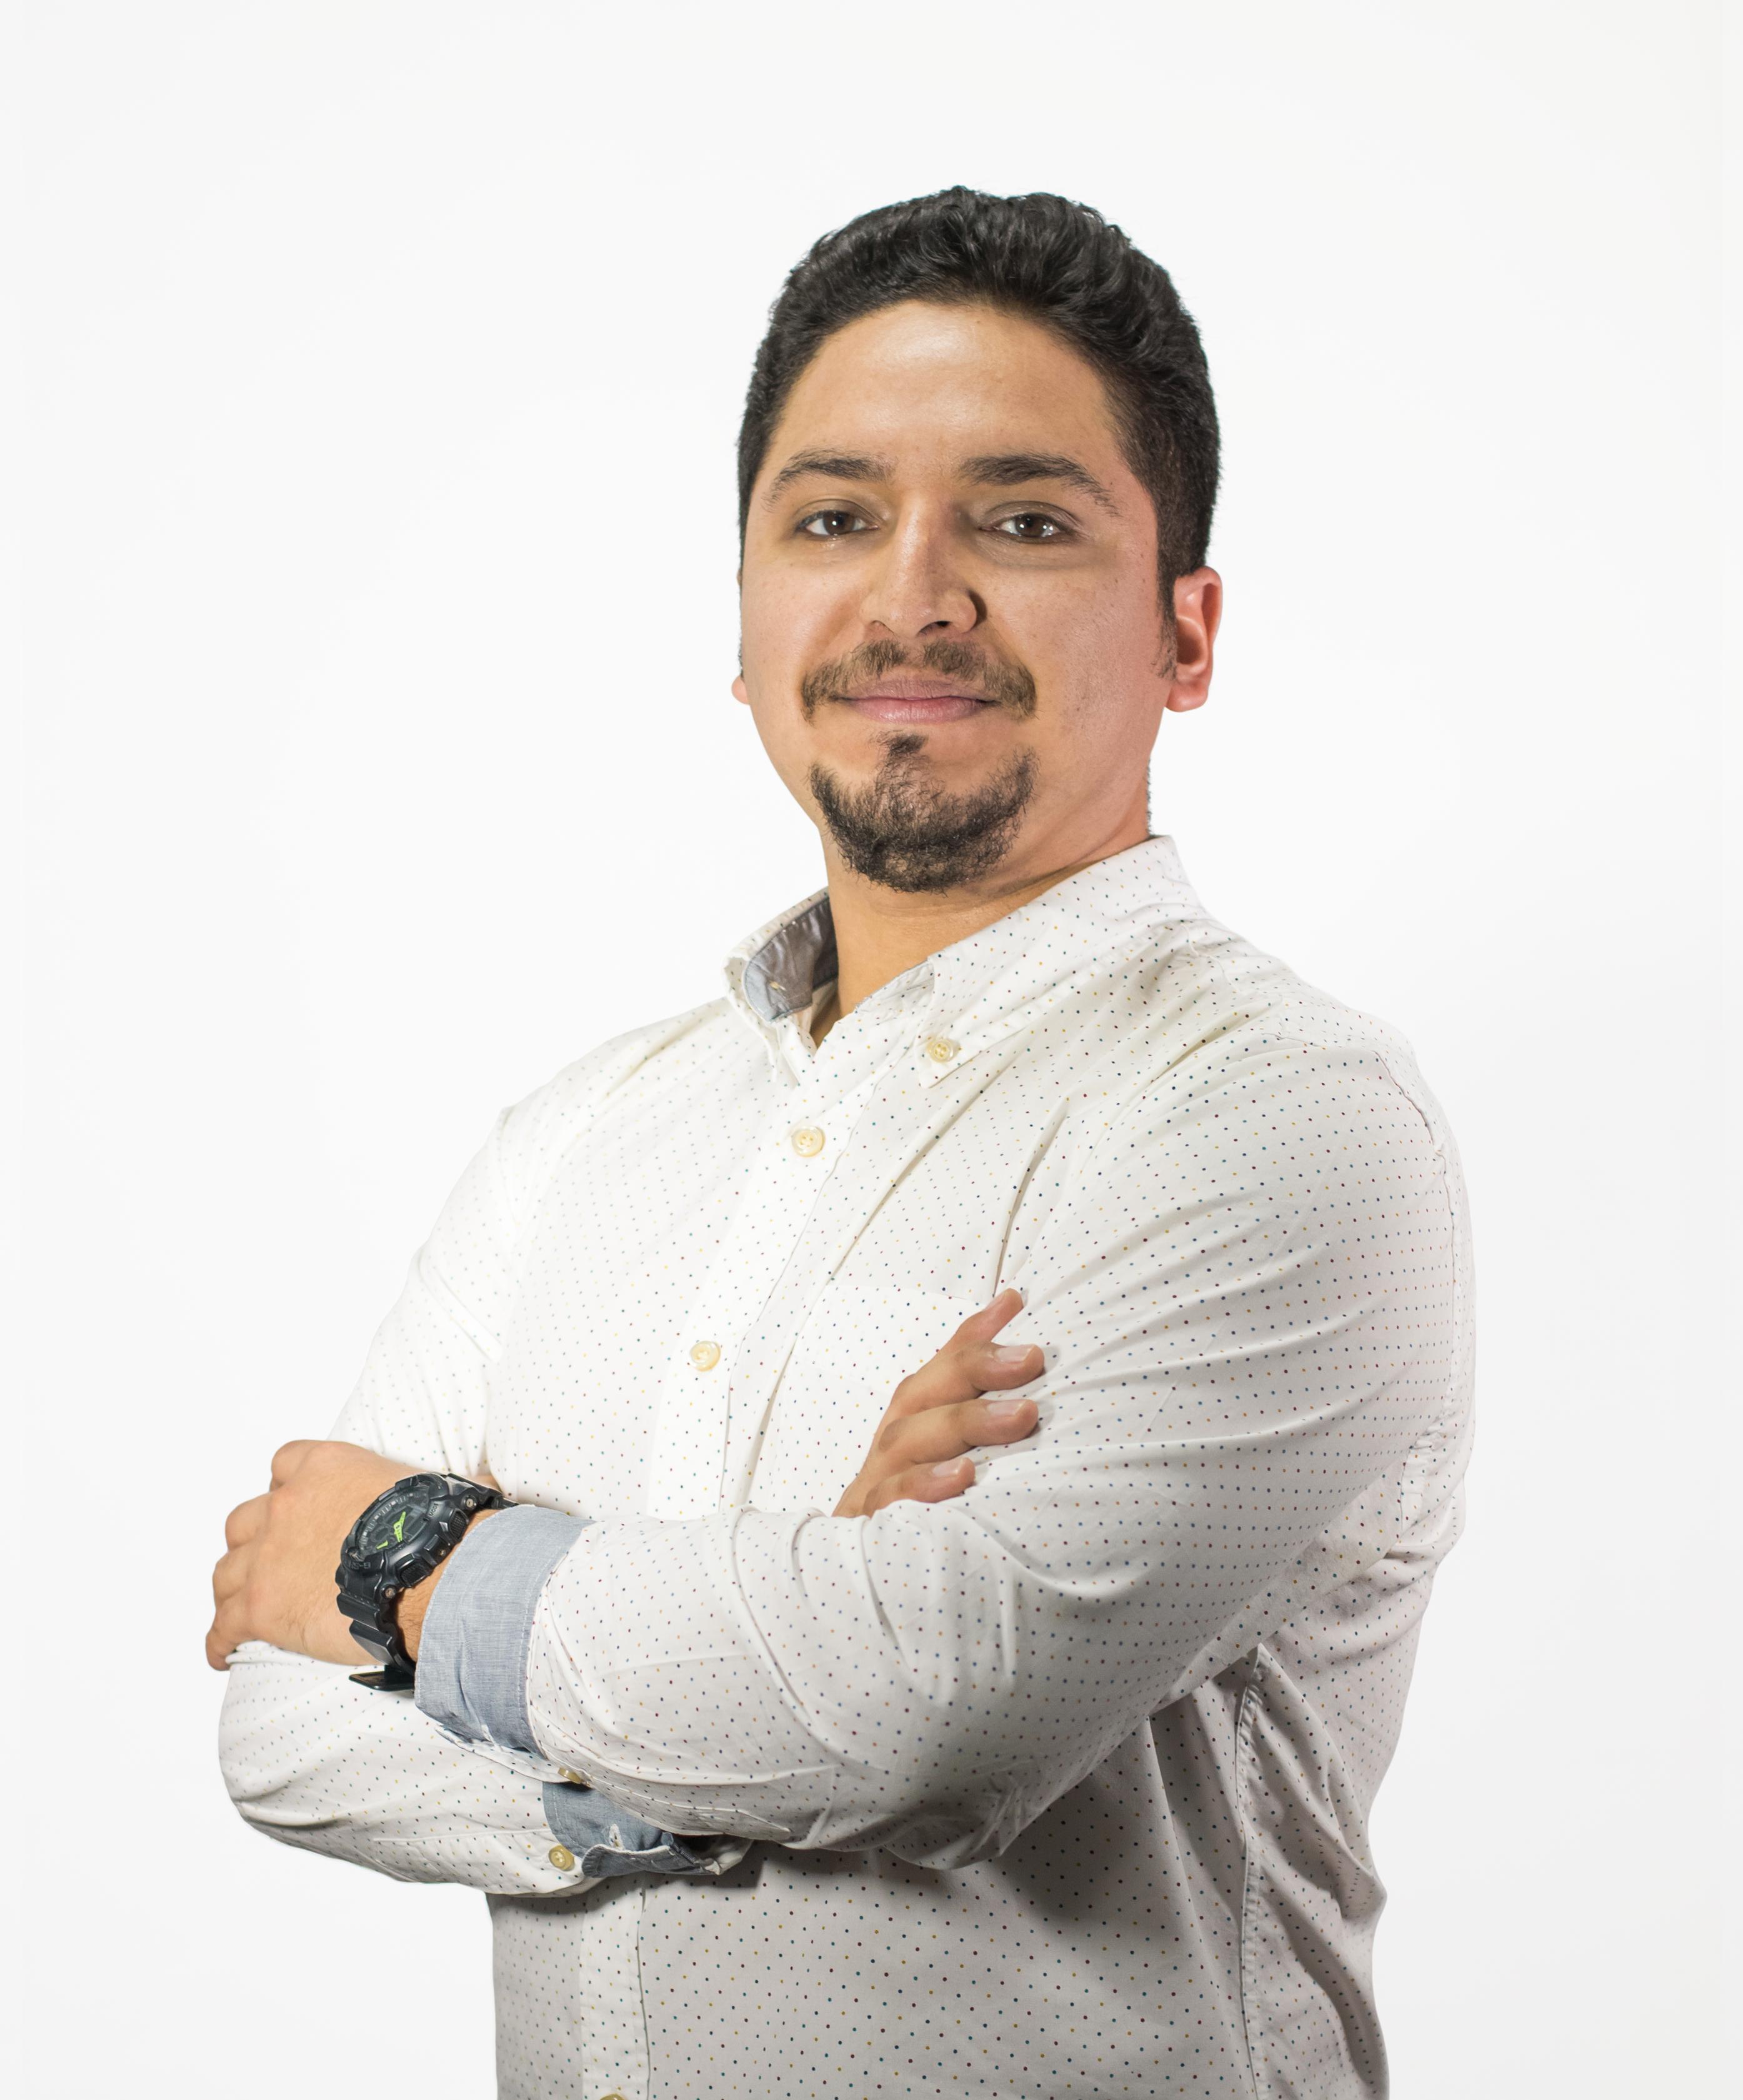 Juntoz-Marketing-Alonso-Ramos